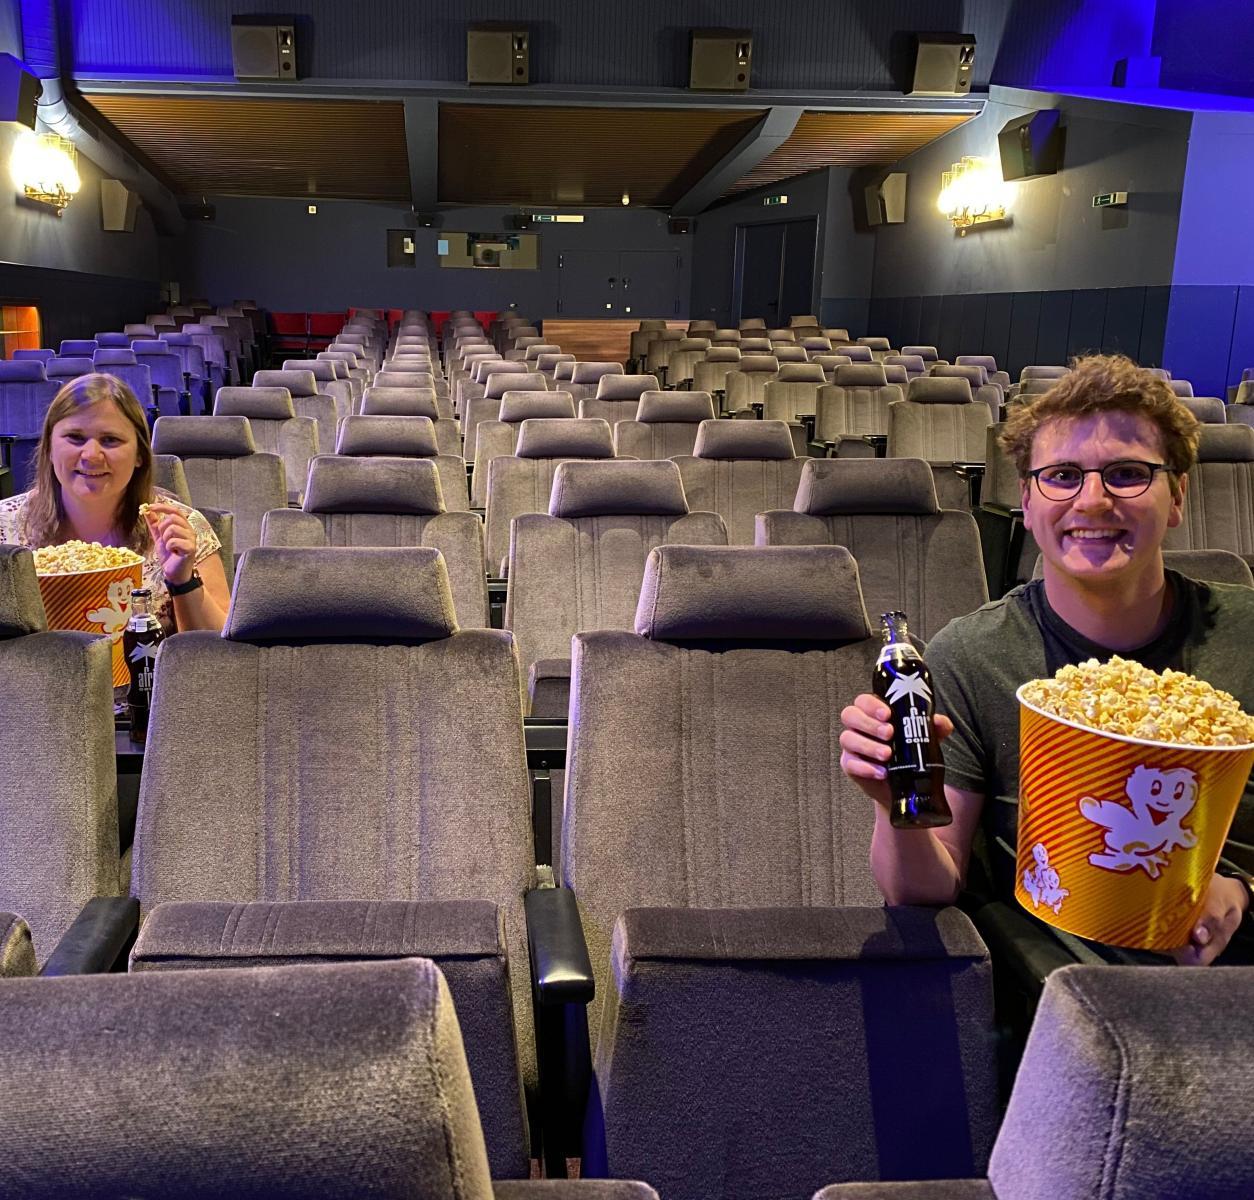 Kino Warendorf Kinoprogramm